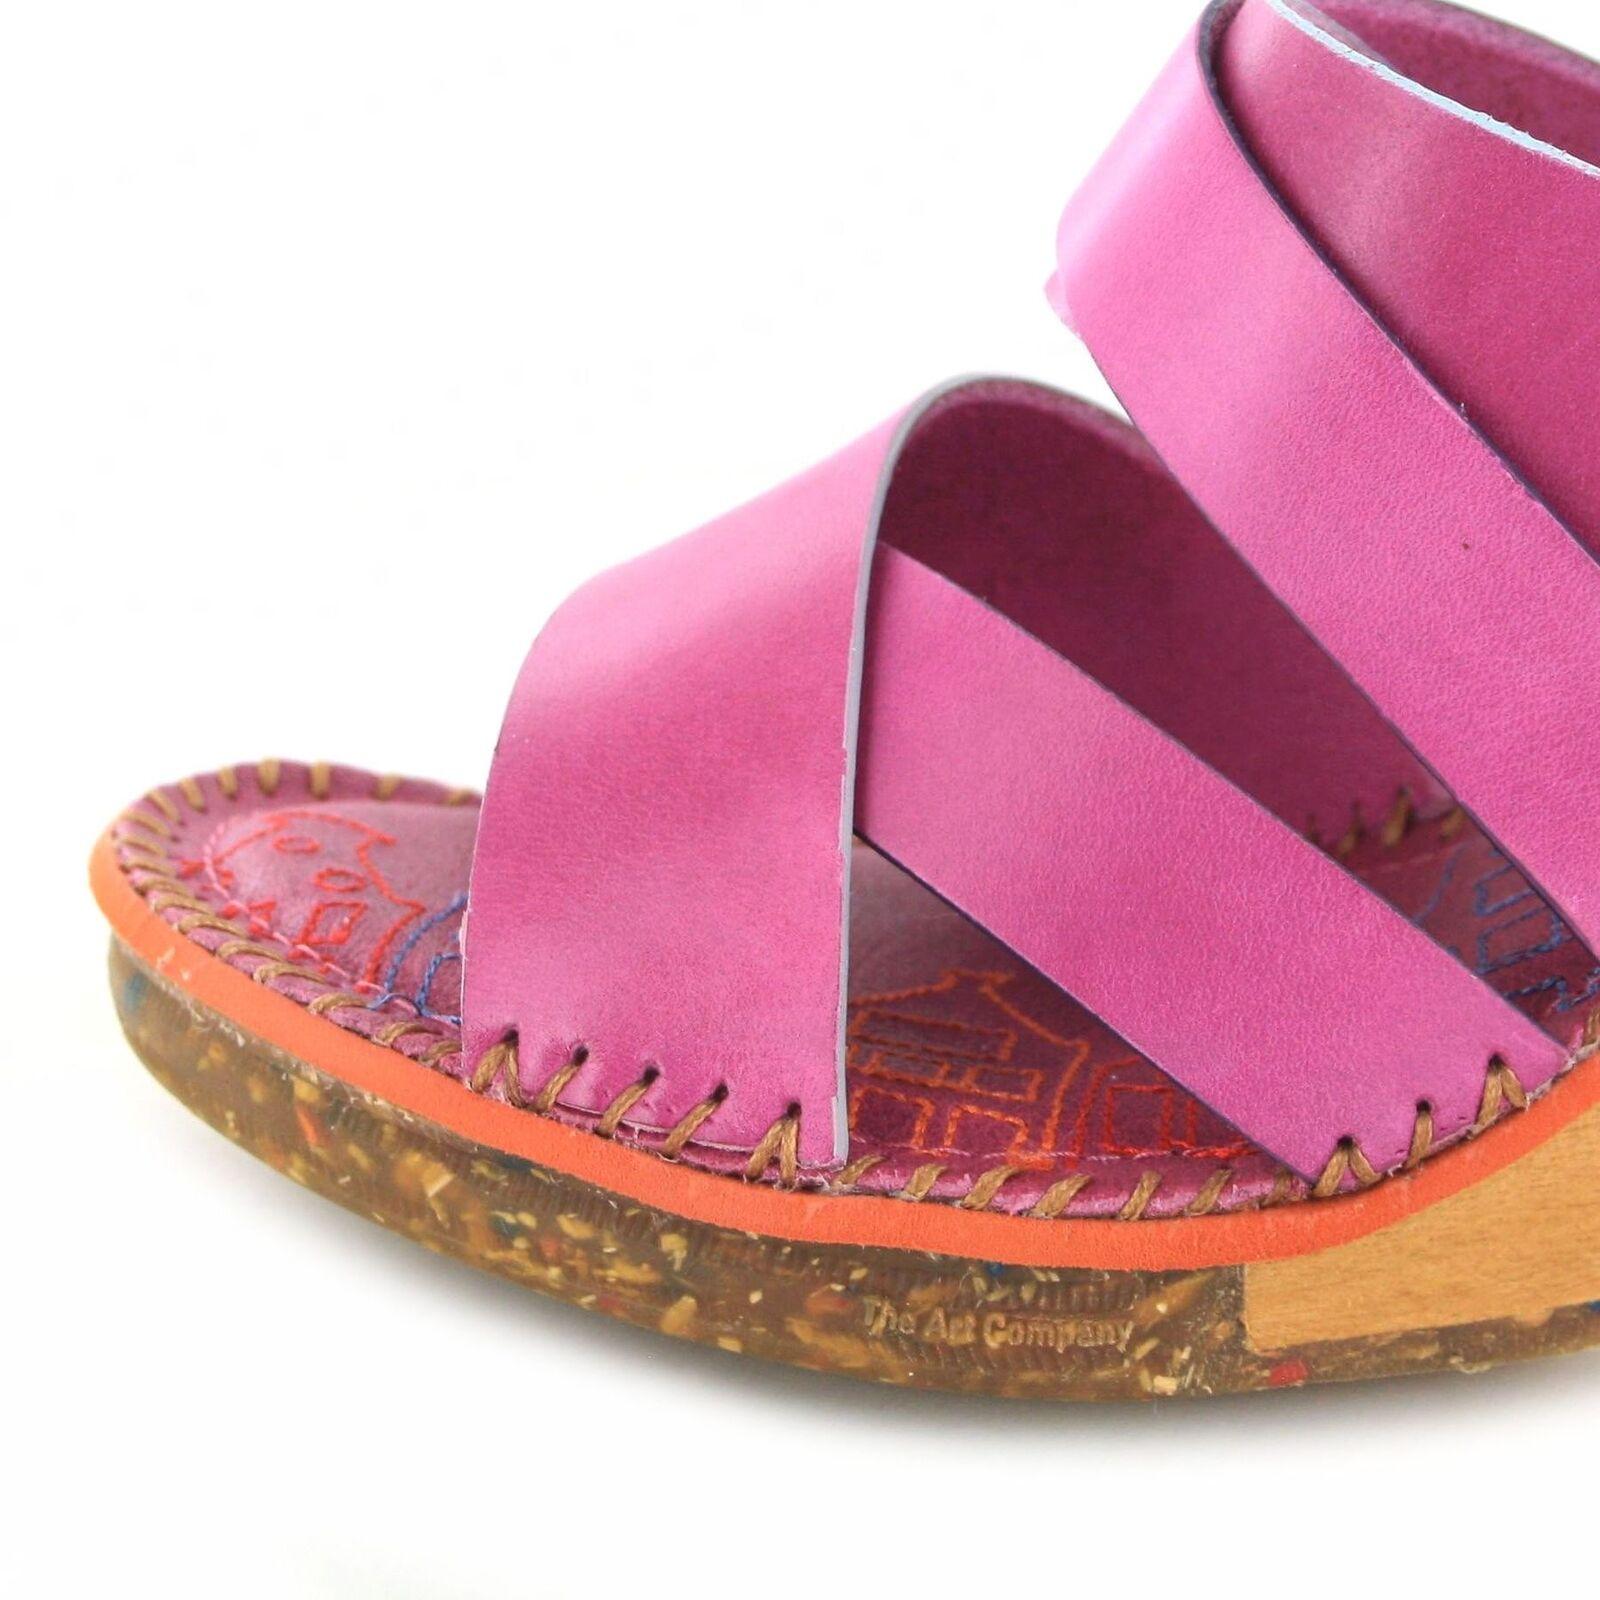 ART 1055 Amsterdam MAGENTA sandalo in in in pelle per donna rosso 164d57